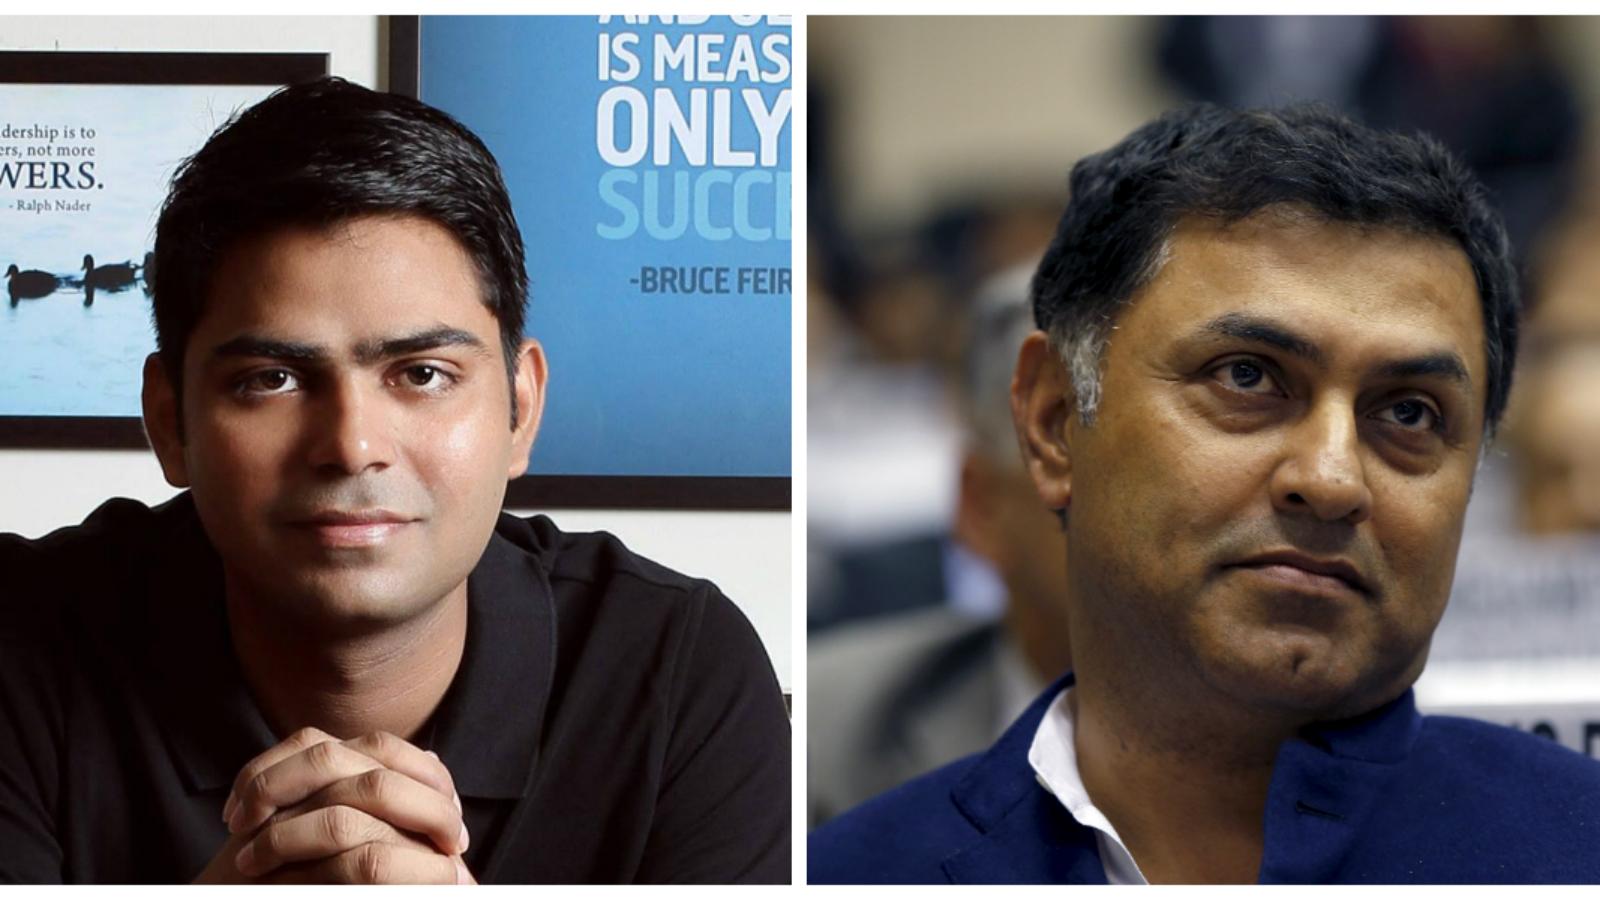 SoftBank-Nikesh Arora-Masatoshi San-Startup-Rahul Yadav